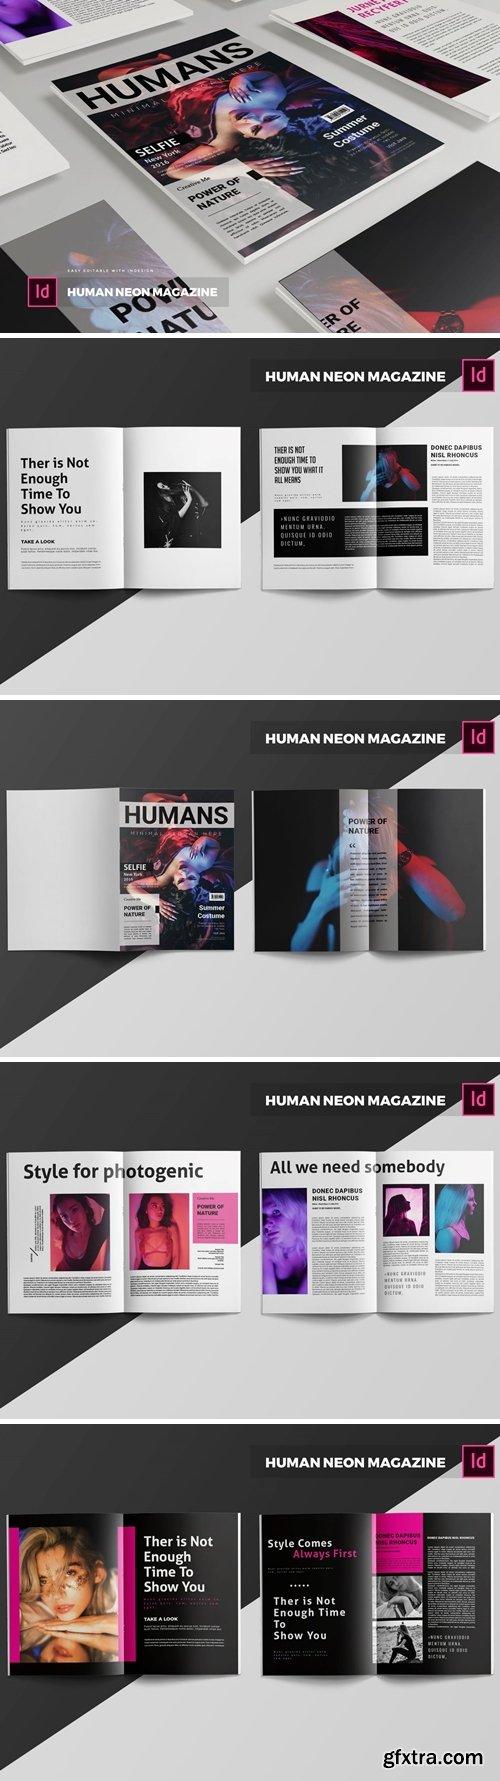 Human Neon   Magazine Template